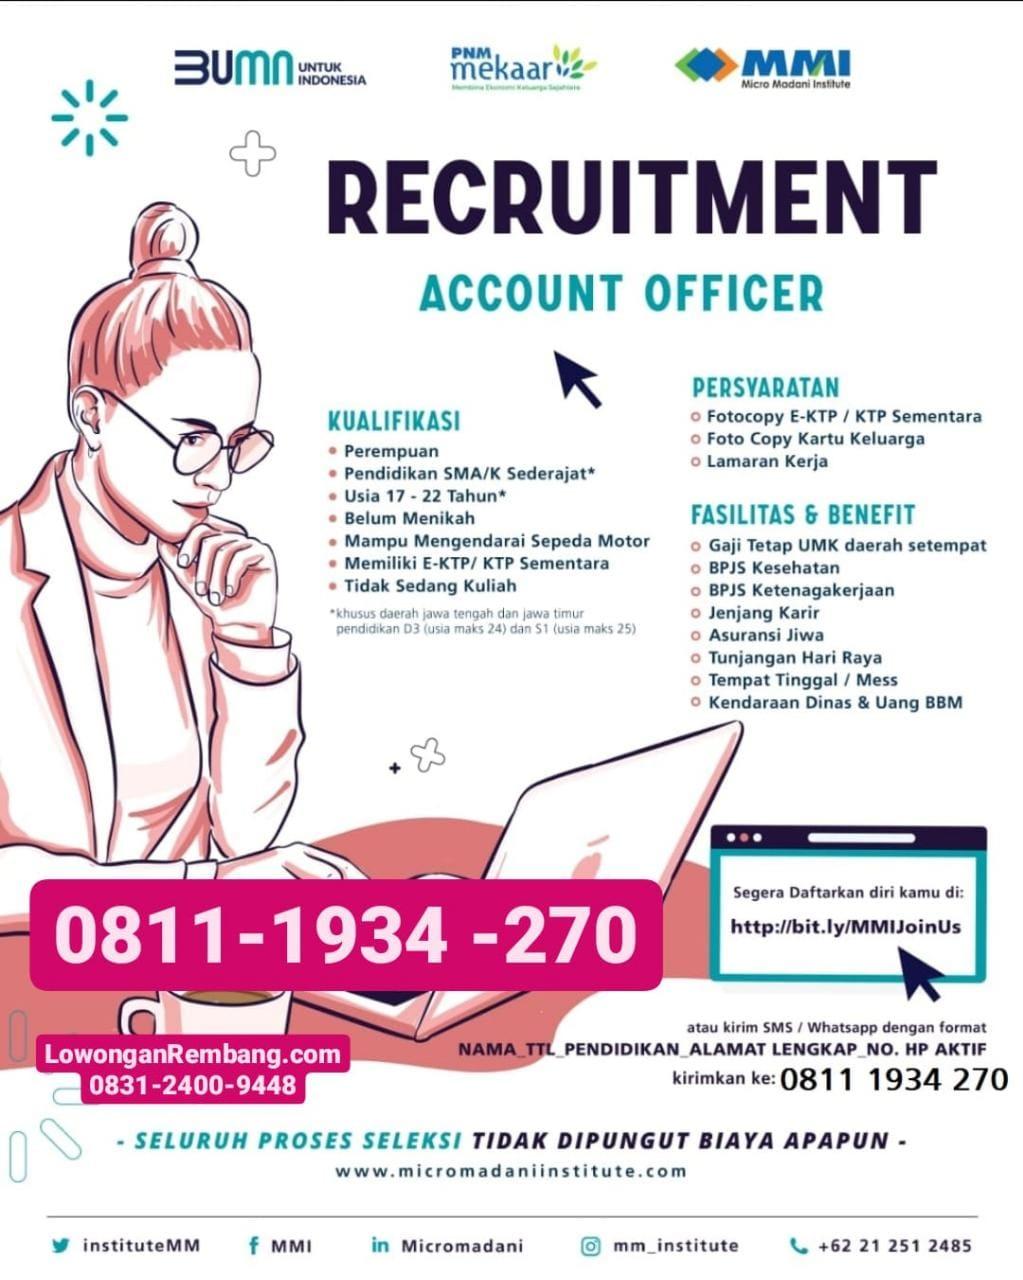 Lowongan Kerja Account Officer Di BUMN PNM Mekaar Rembang Dapat Gaji Tetap UMK BPJS Motor Asuransi Tunjangan Mess Bensin Dll